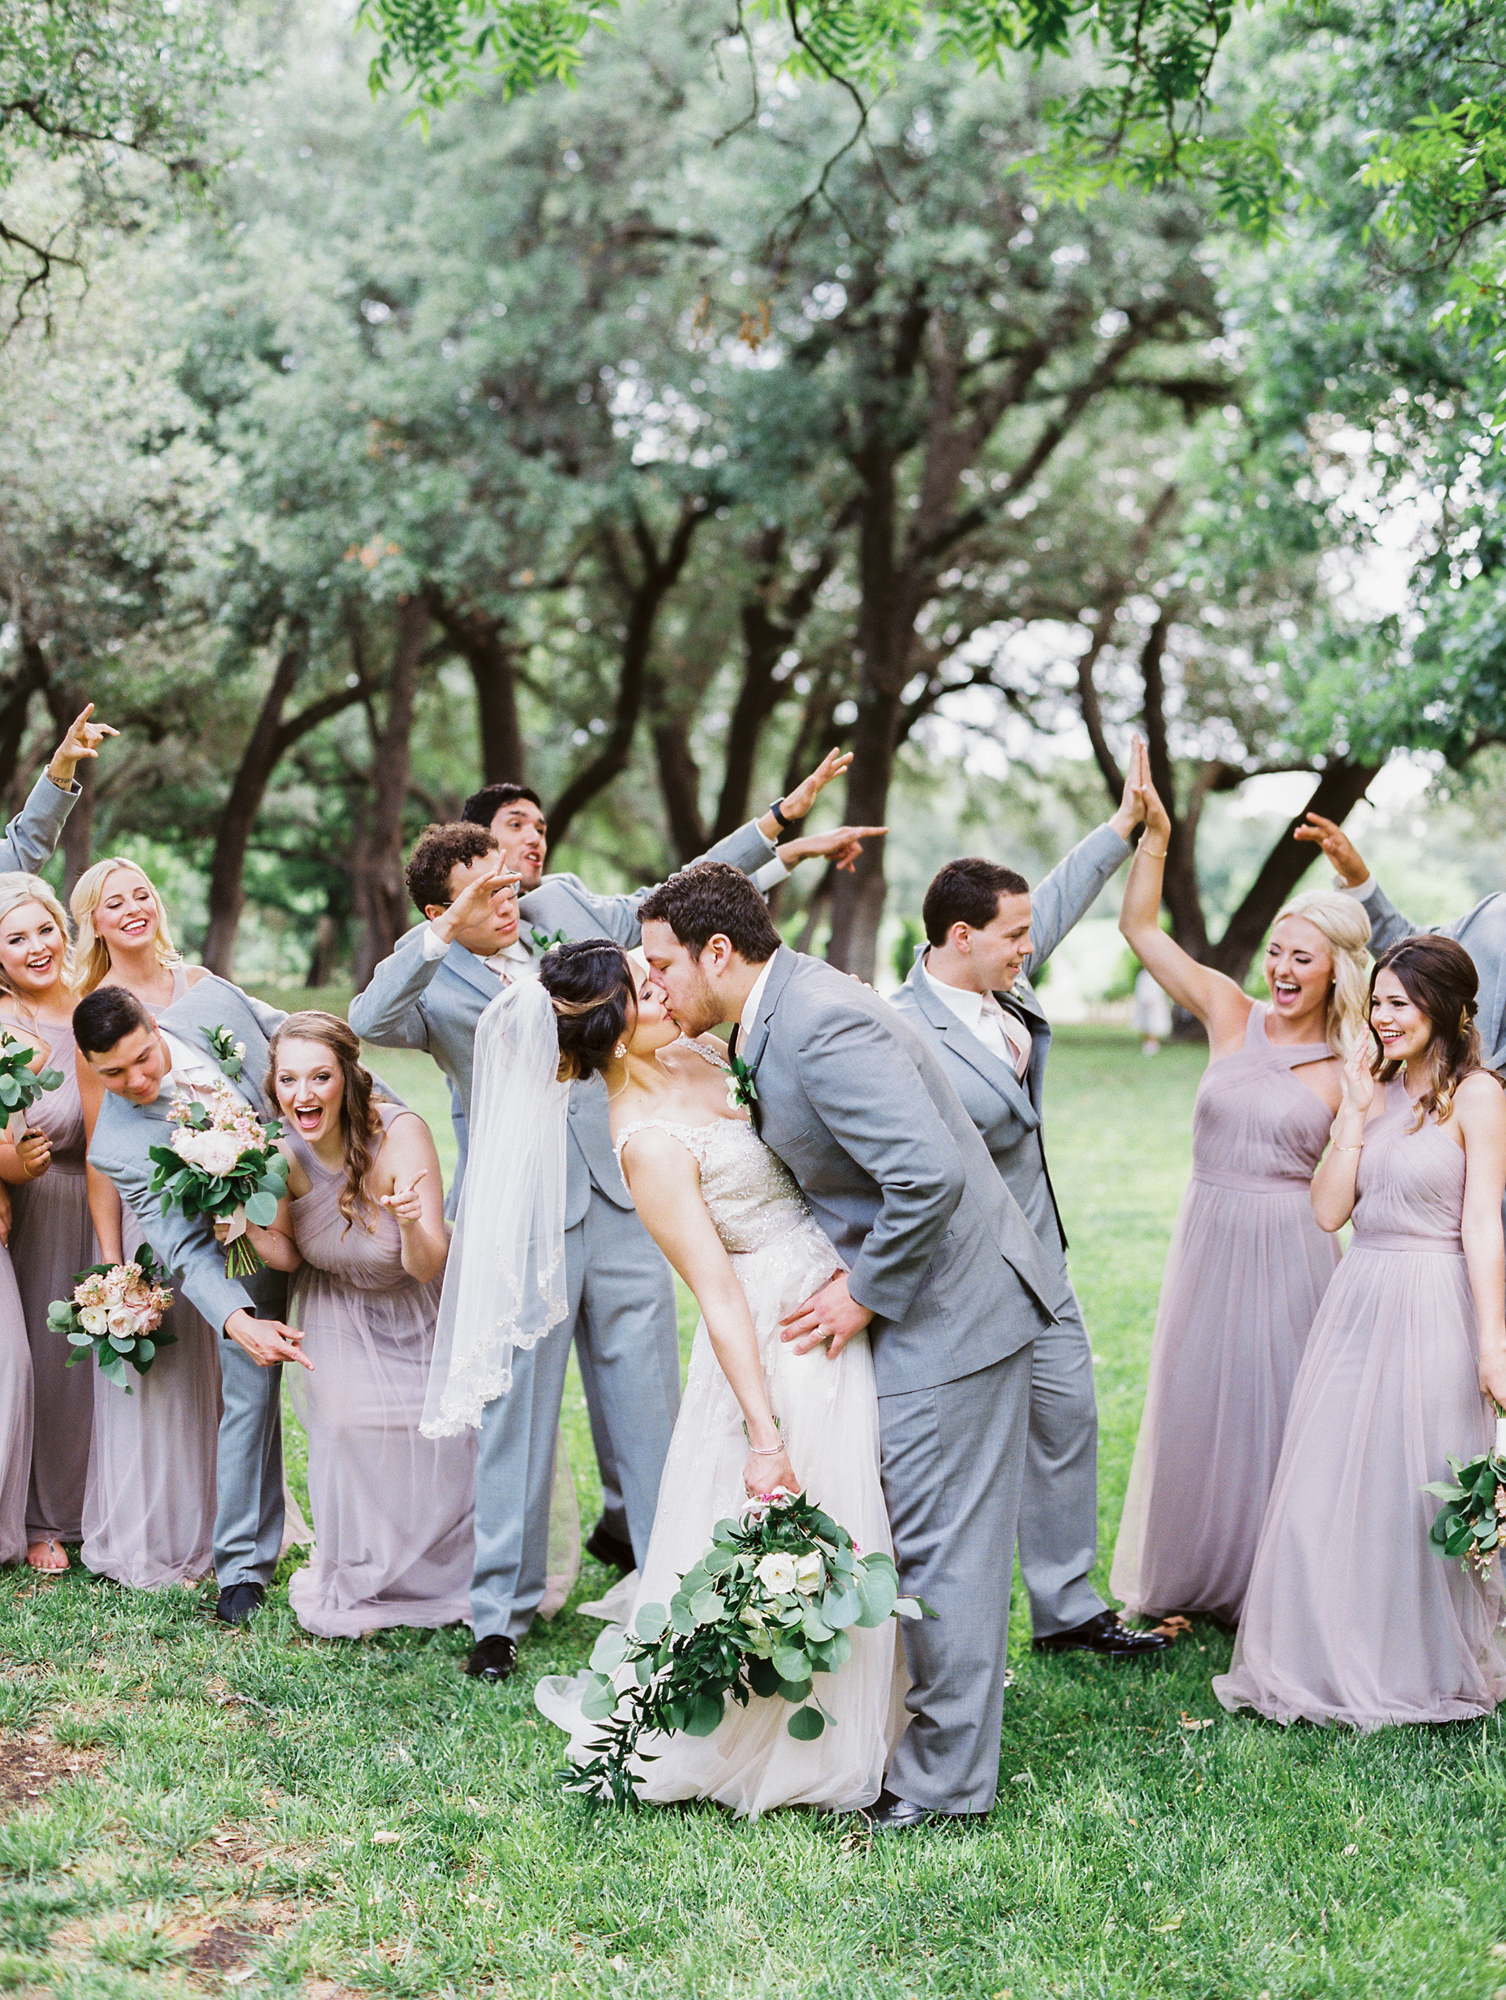 Elegant Spring Vineyard Wedding | Film Wedding Photographer | Austin Wedding Photographer | Neutral and Gray Bridal Party | Britni Dean Photography // britnidean.com